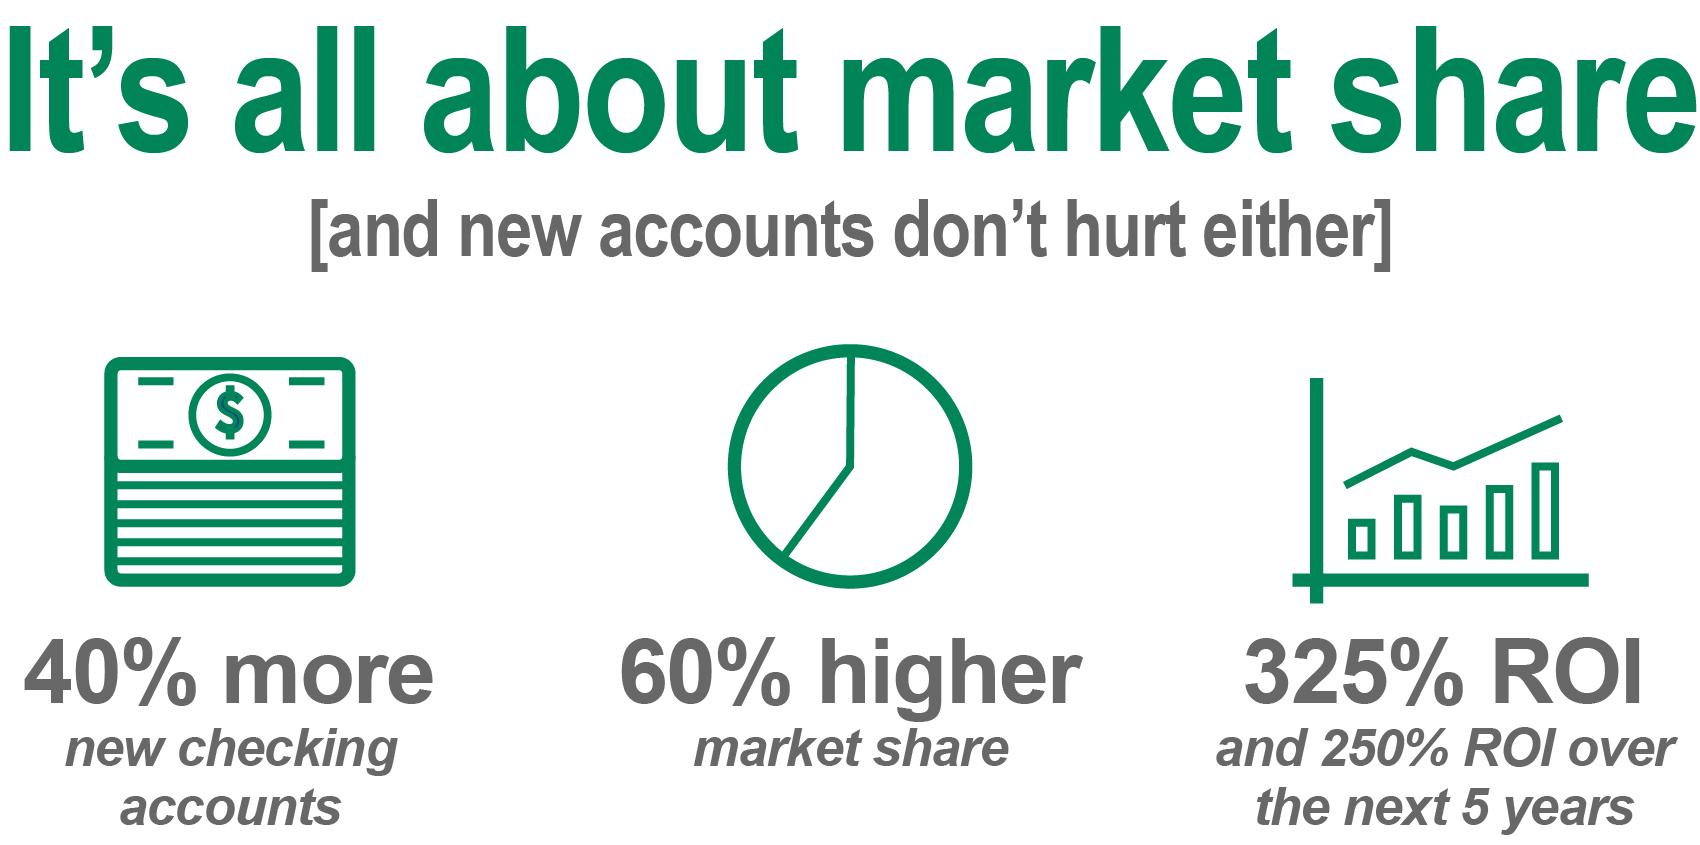 DSSG_marketshare.jpg